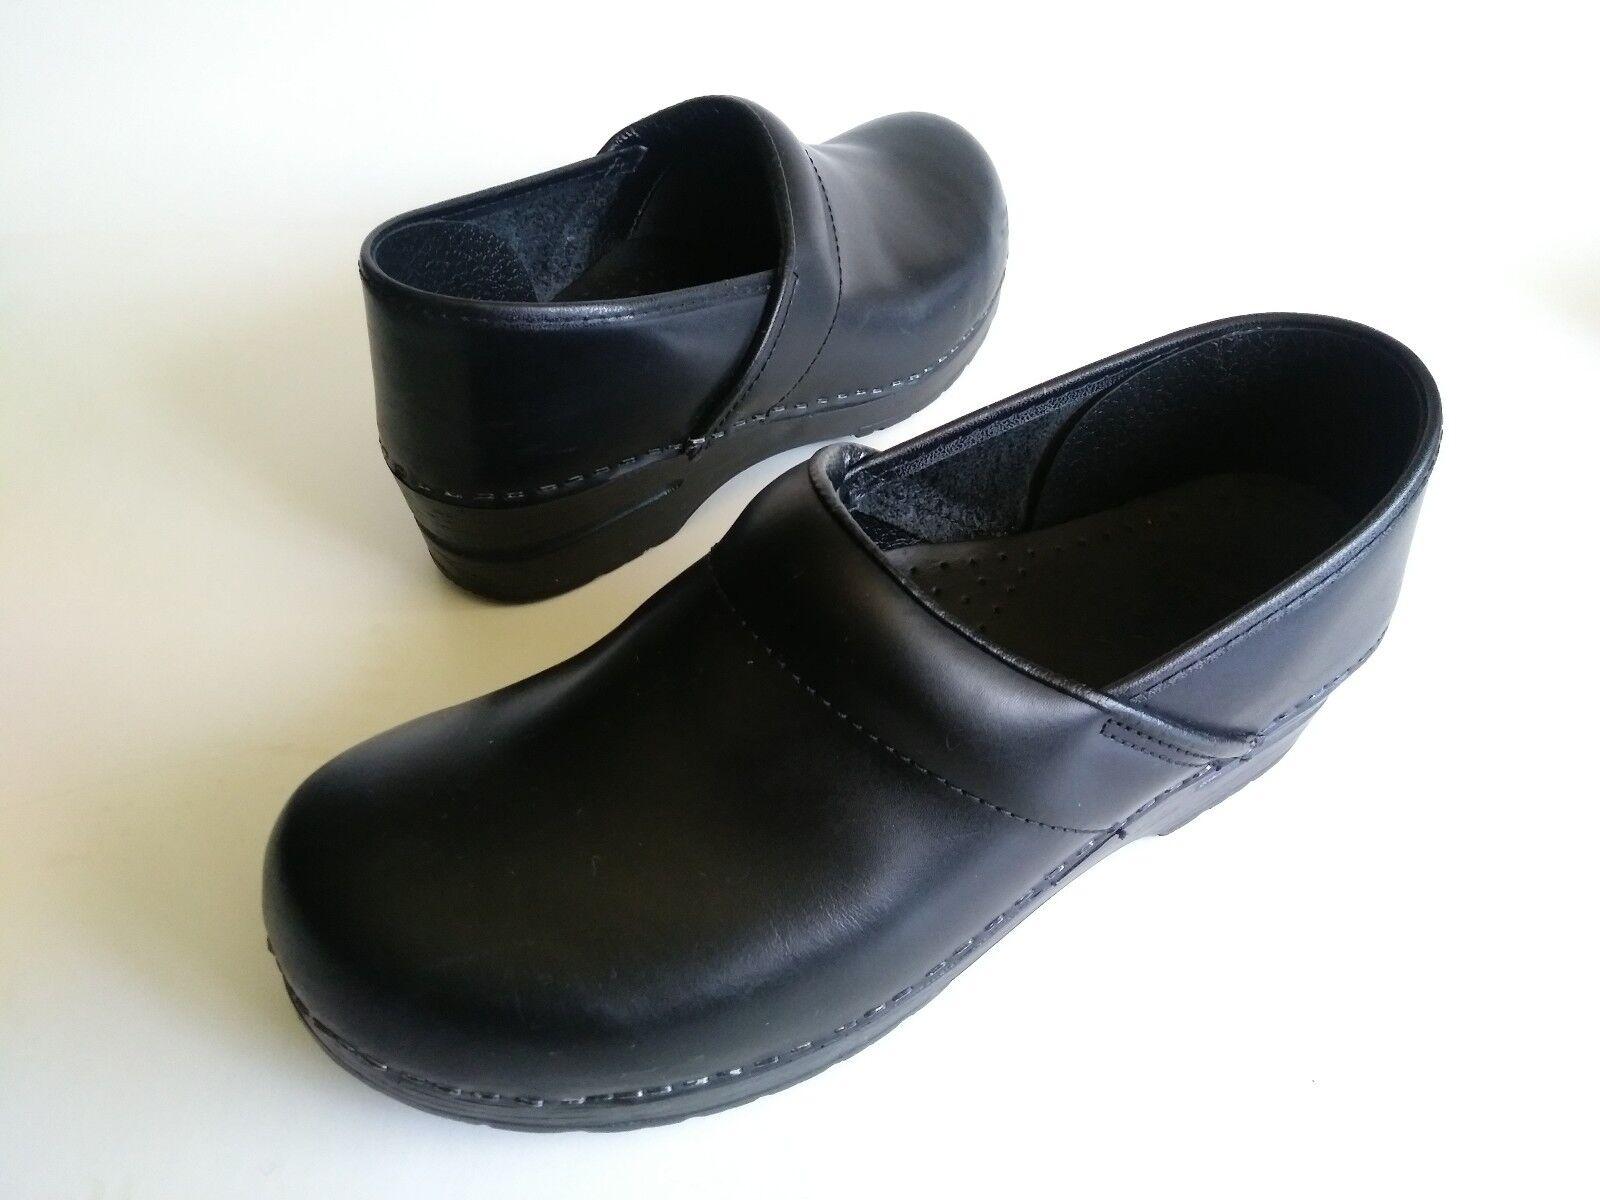 DANSKO PROFESSIONAL Non-Slip Nurse Clogs shoes Black Leather Womens Womens Womens Size 10.5-11 a832c2